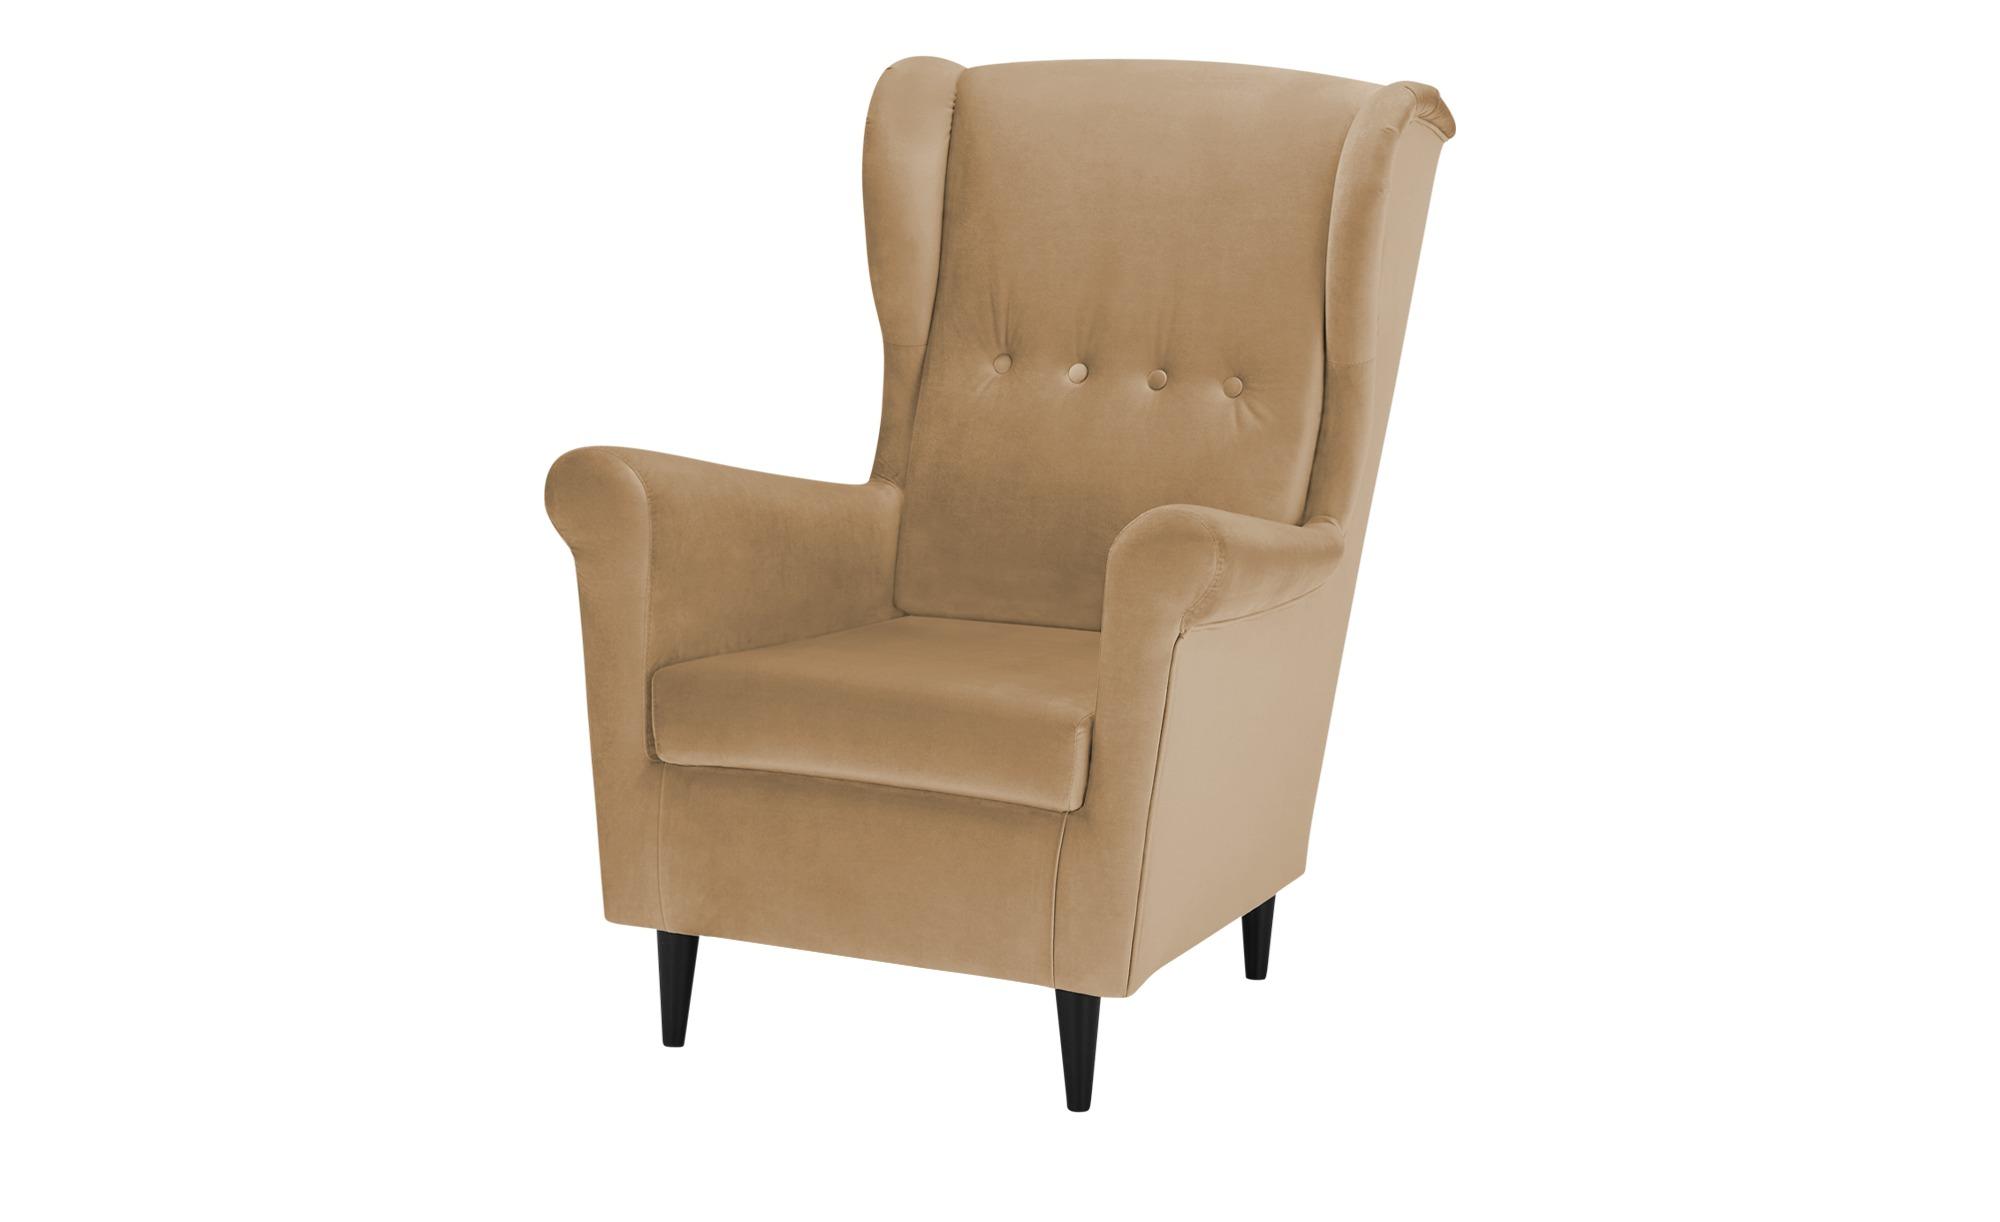 smart Sessel  Hubertine ¦ beige ¦ Maße (cm): B: 82 H: 102 T: 89 Polstermöbel > Sessel > Ohrensessel - Höffner